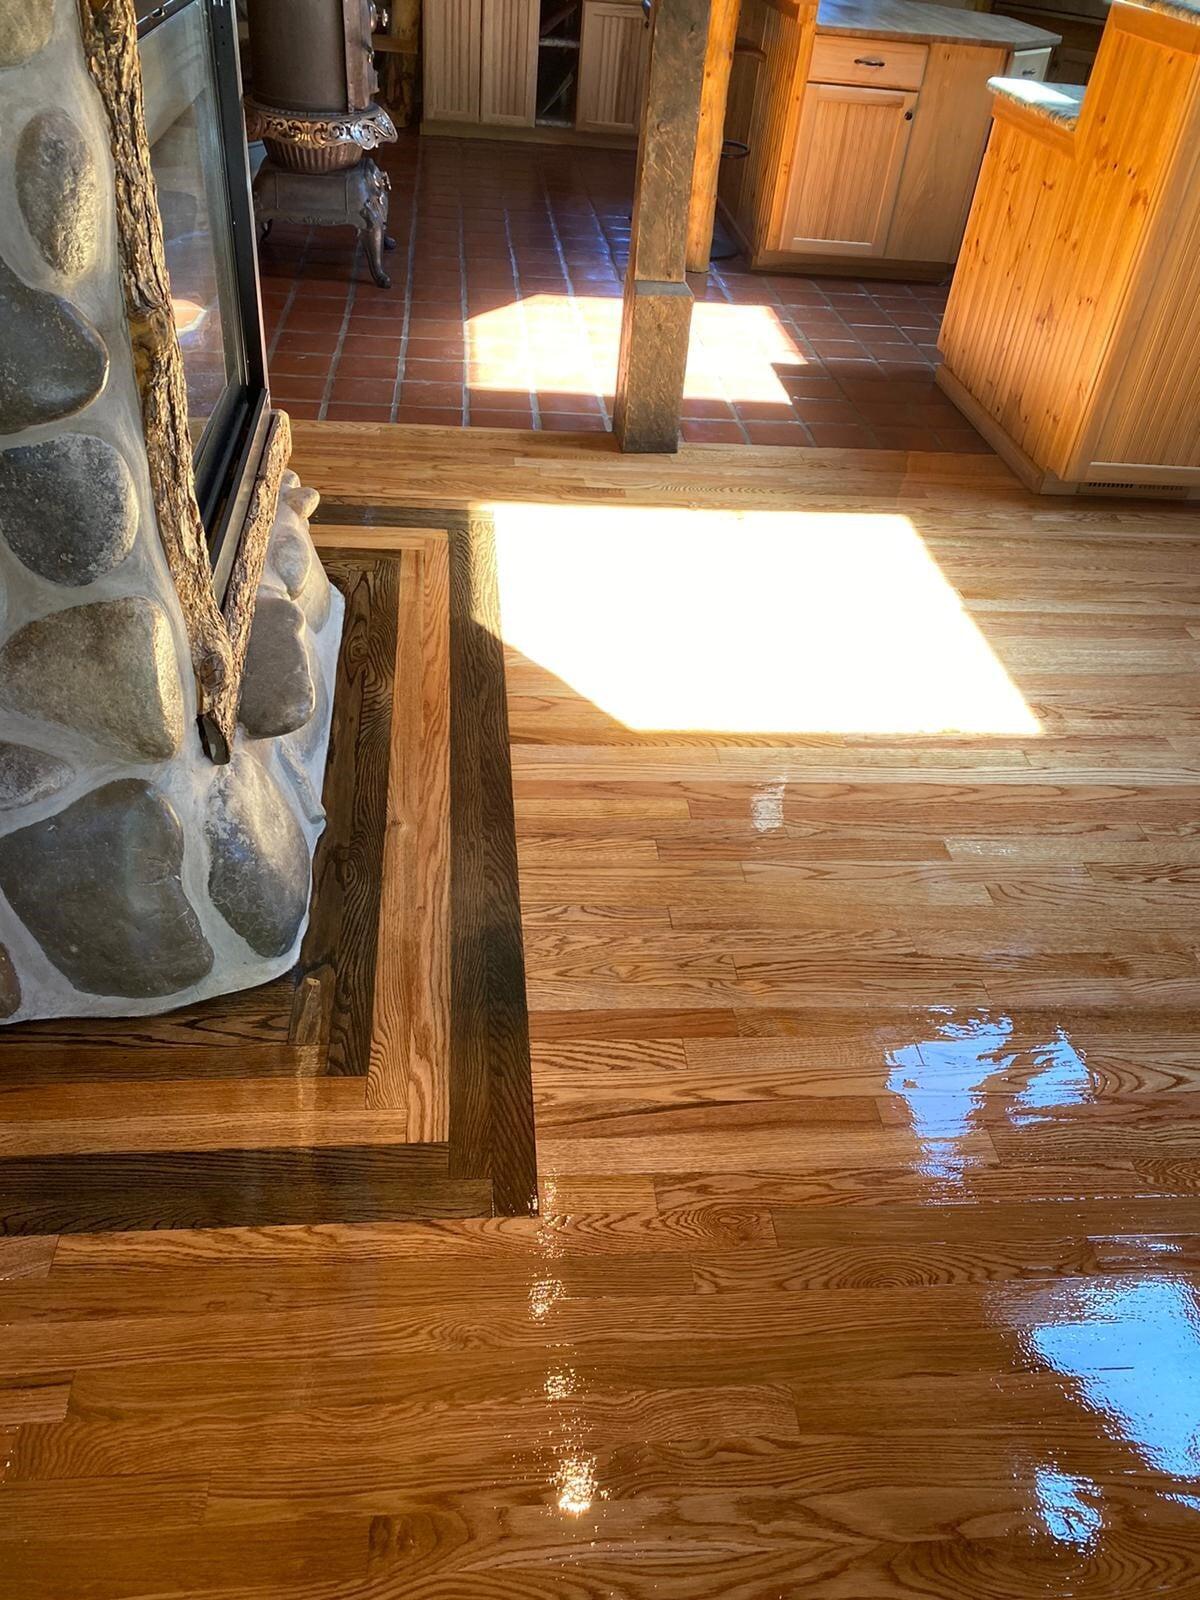 Luxury vinyl plank floors in Centennial, CO from FH Flooring